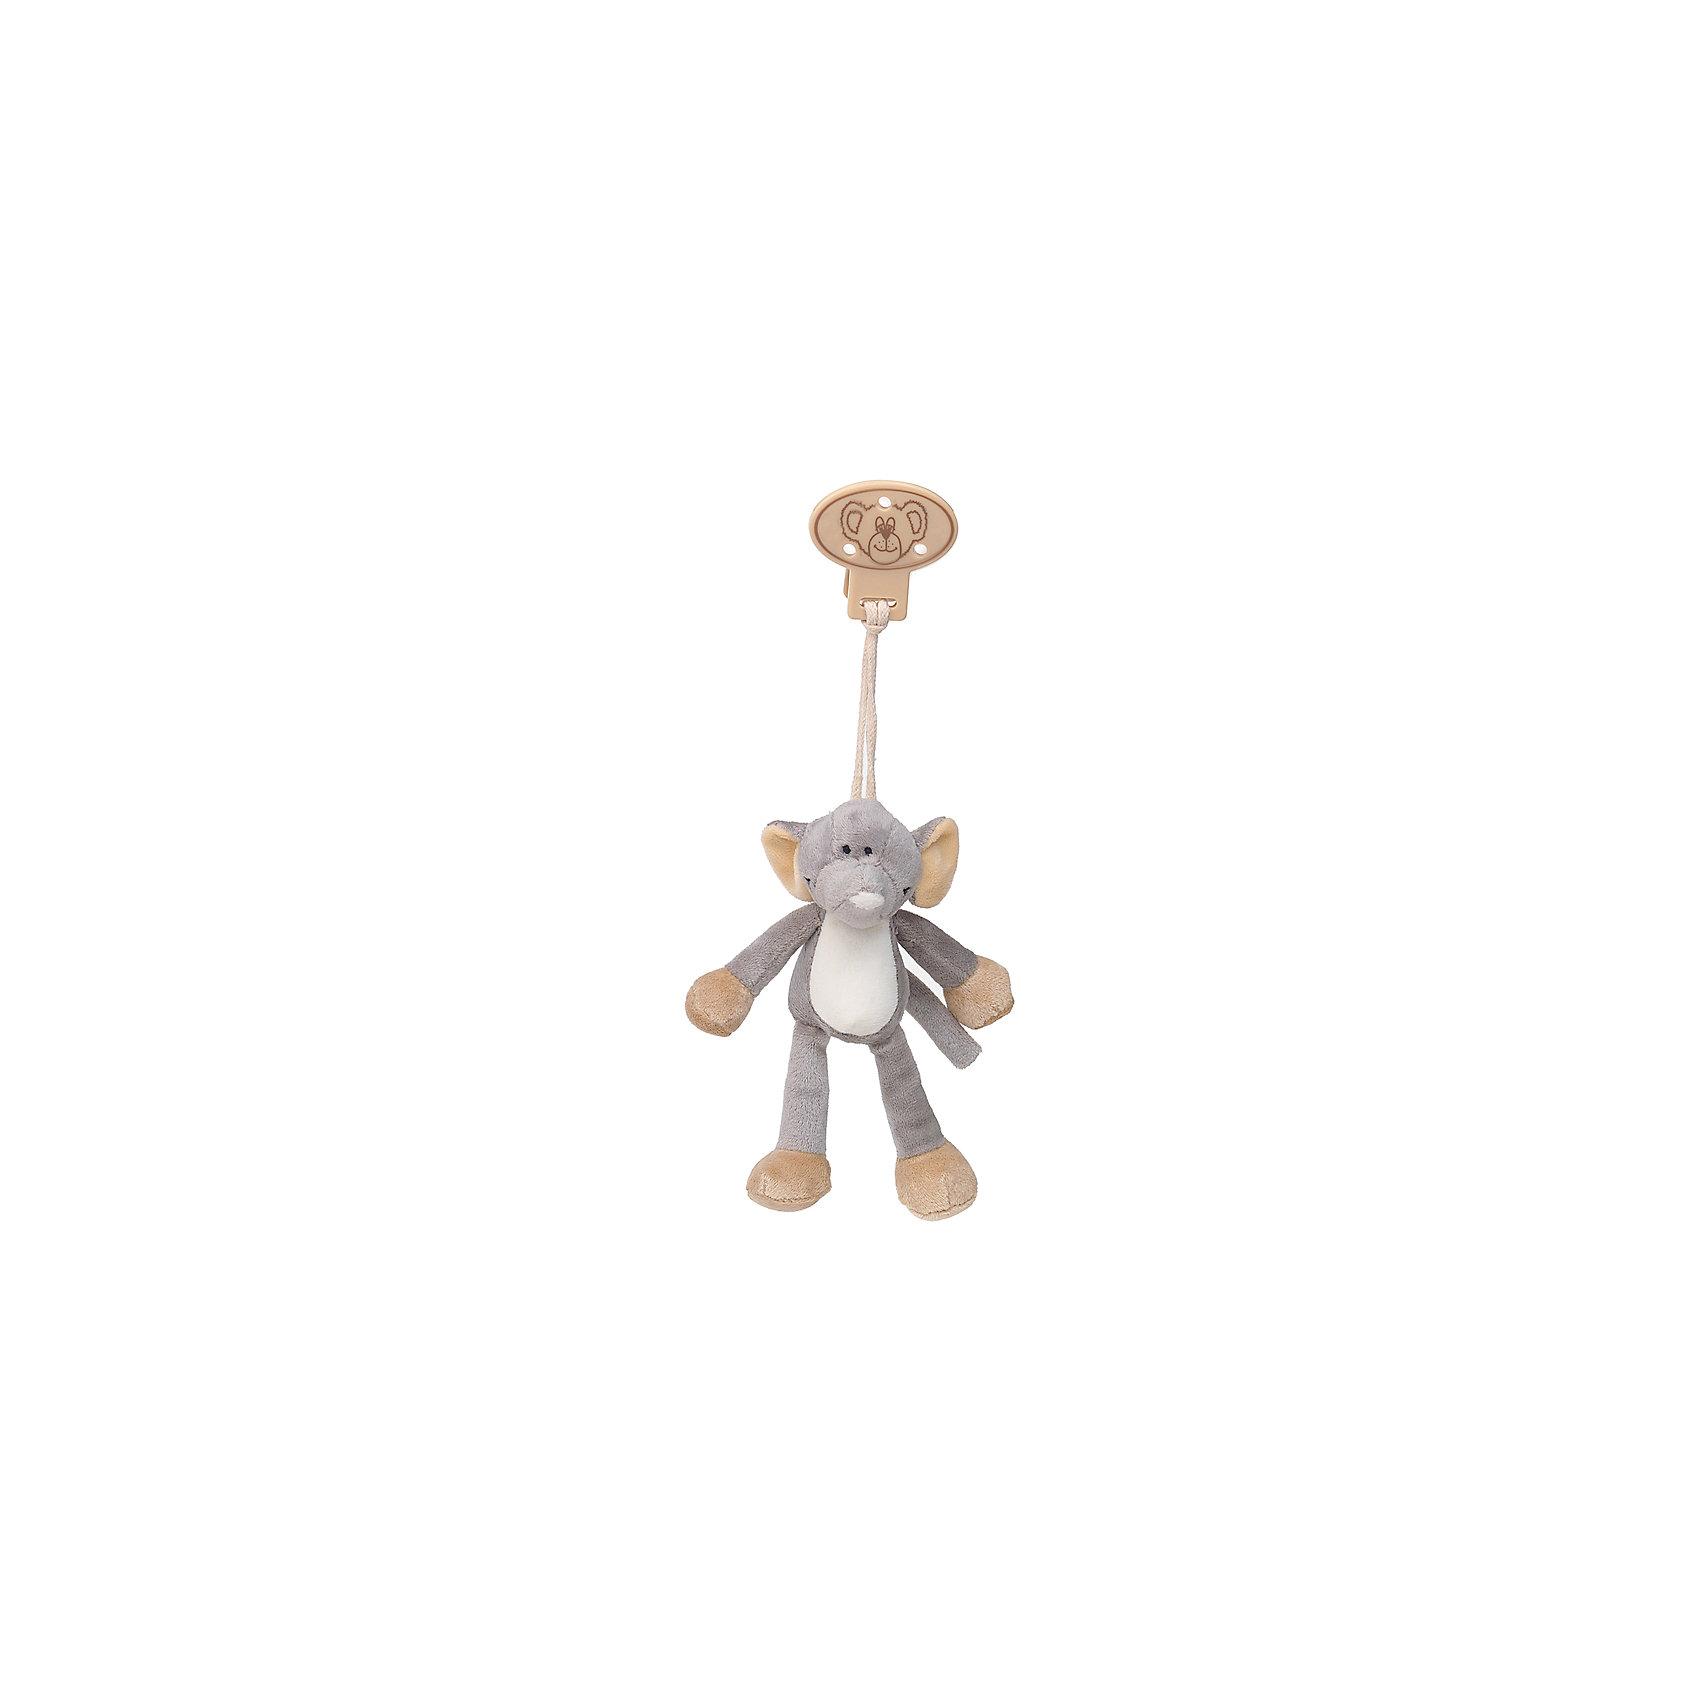 Клипса с игрушкой Слон, Динглисар, Teddykompaniet